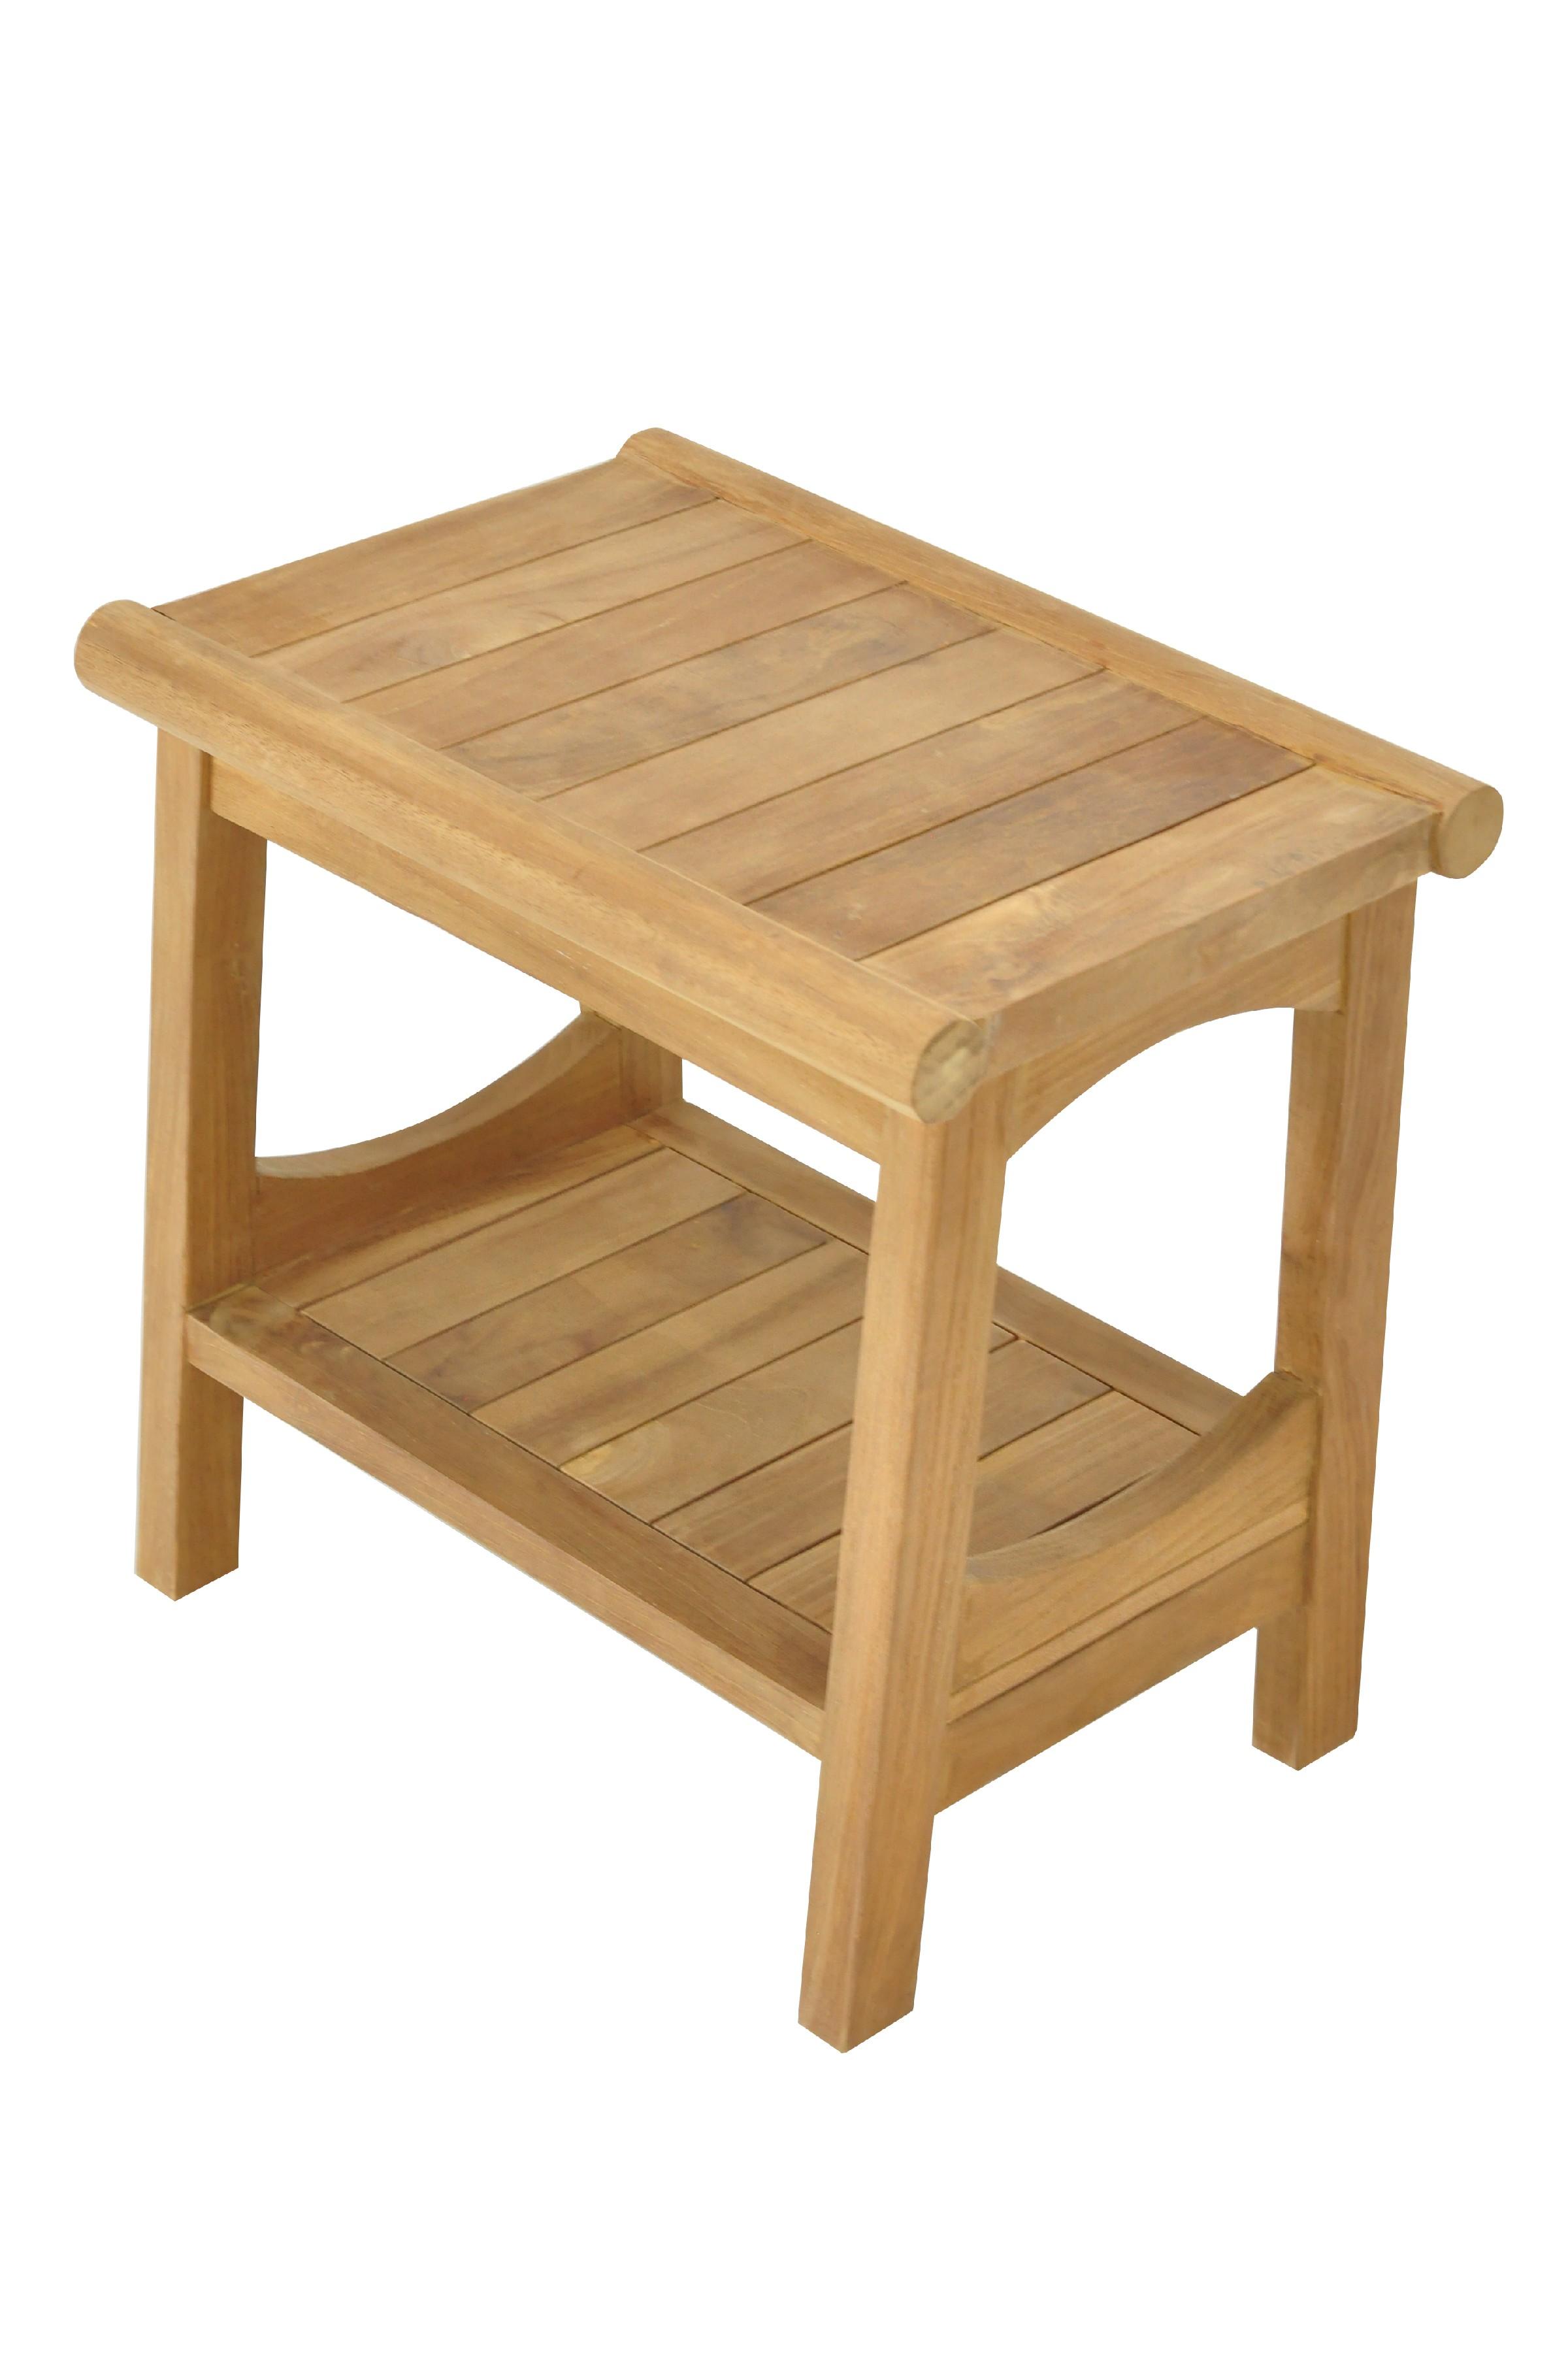 Astounding Details About Grade A Teak Wood Perth Shower Seat 18 Stool Bench Outdoor Patio Uwap Interior Chair Design Uwaporg